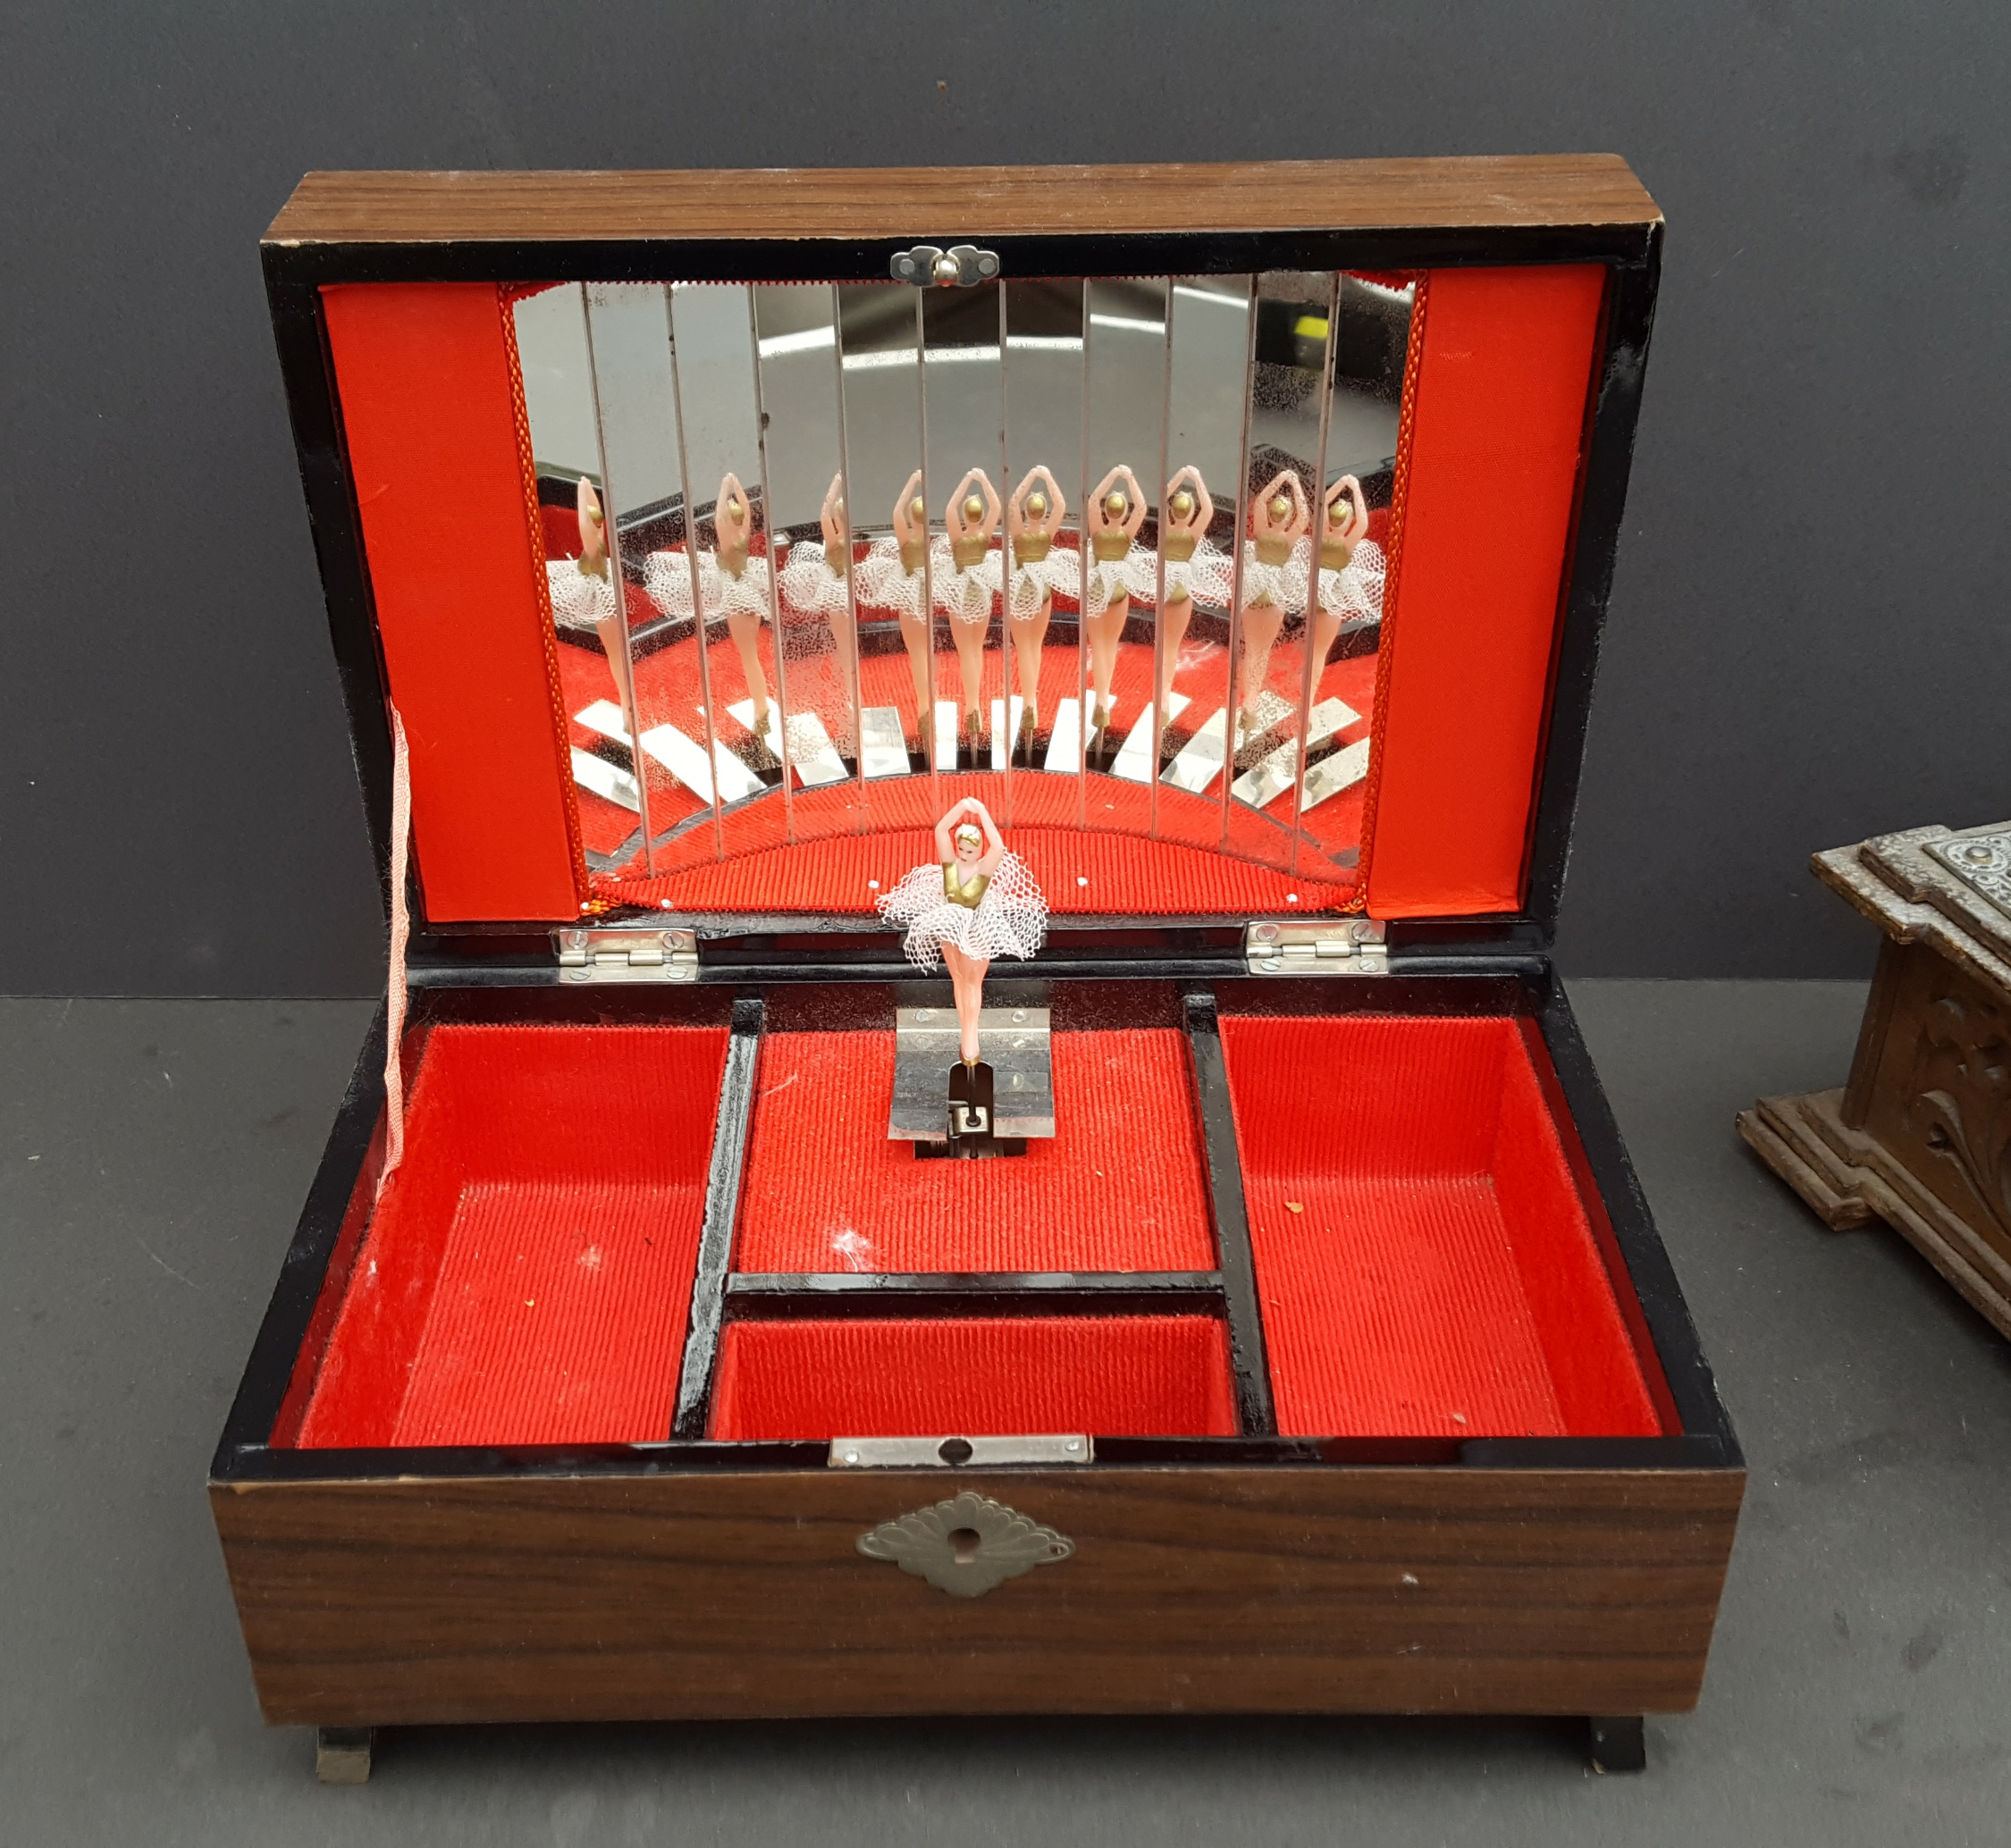 Lot 38 - Vintage Retro 2 x Jewellery Box 1 Musical NO RESERVE